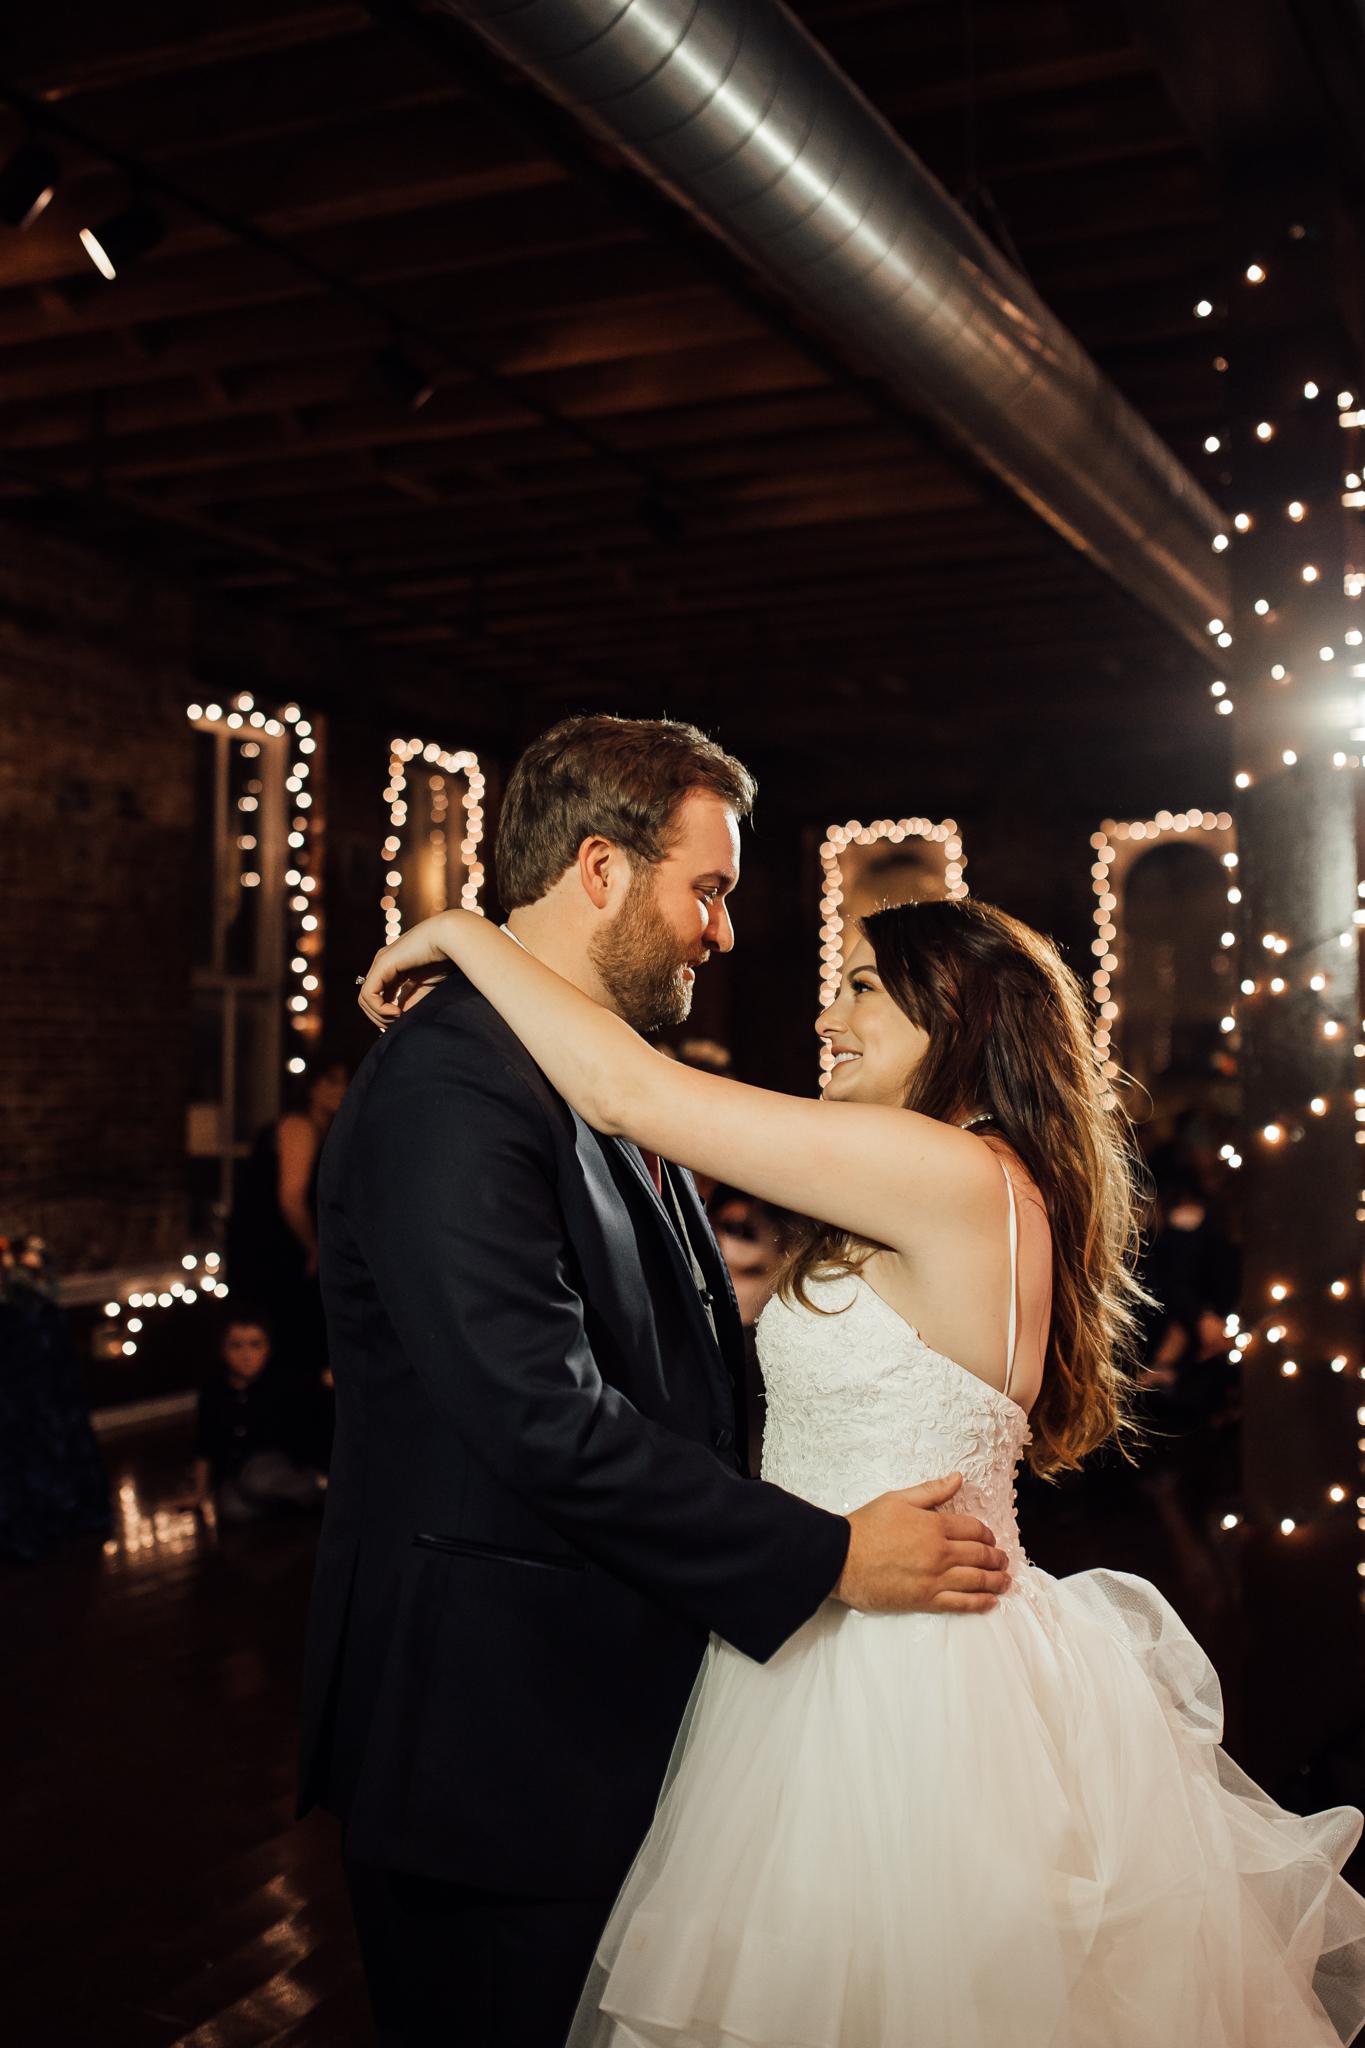 memphis-wedding-photographers-thewarmtharoundyou-ballinese-ballroom (49 of 65).jpg